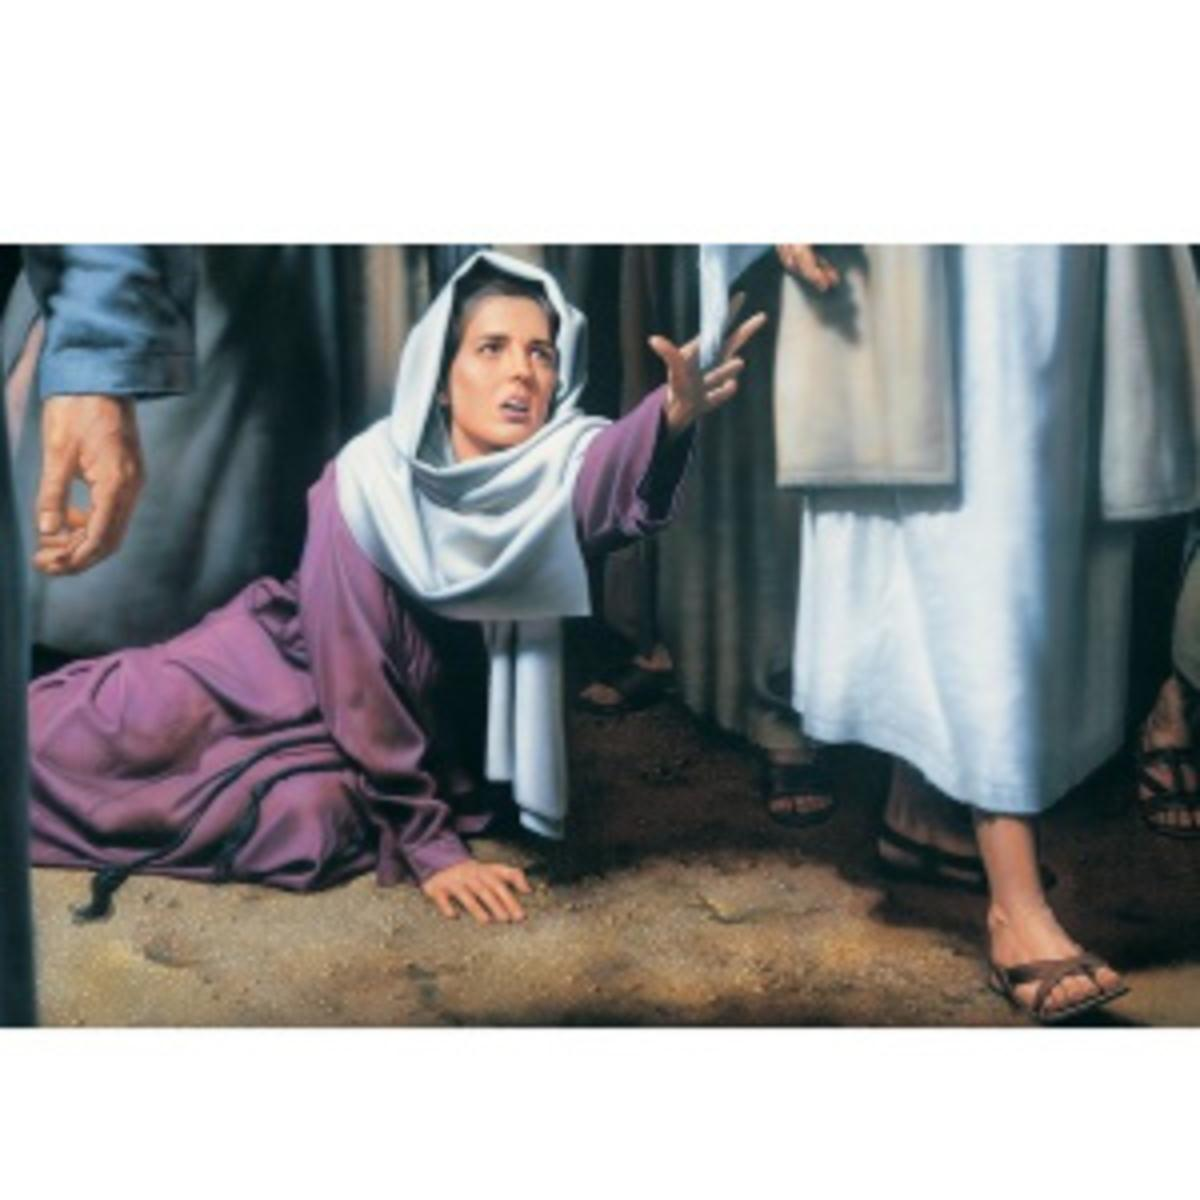 woman reaches for cloak